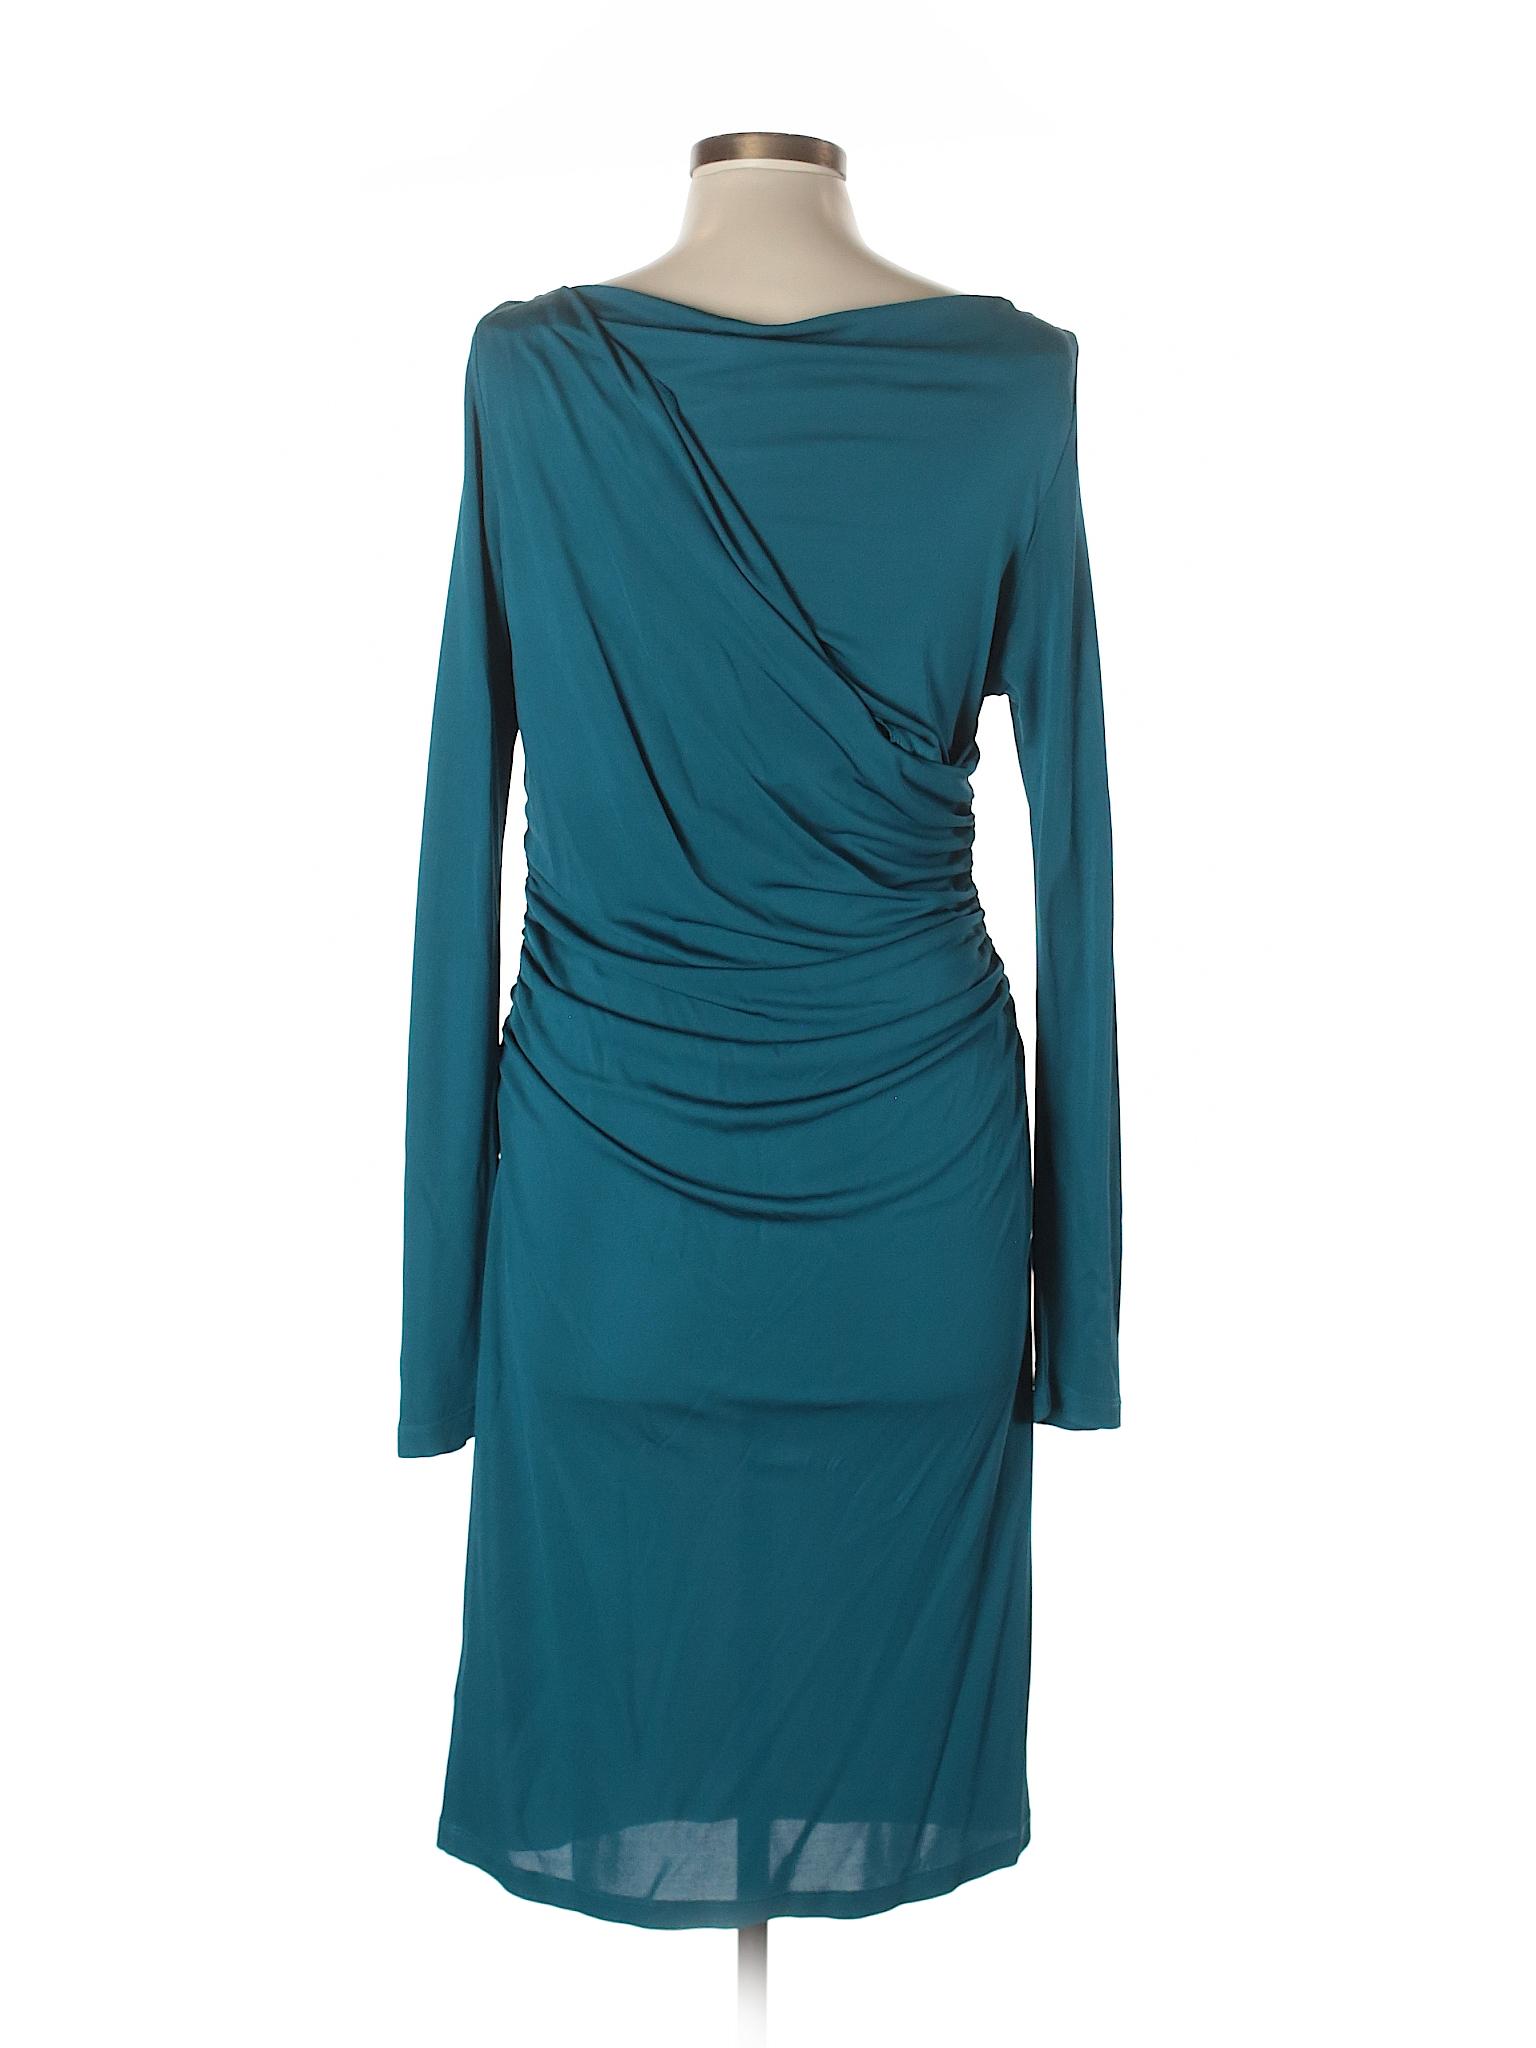 Casual L winter Boutique K Bennett Dress SI5Tw